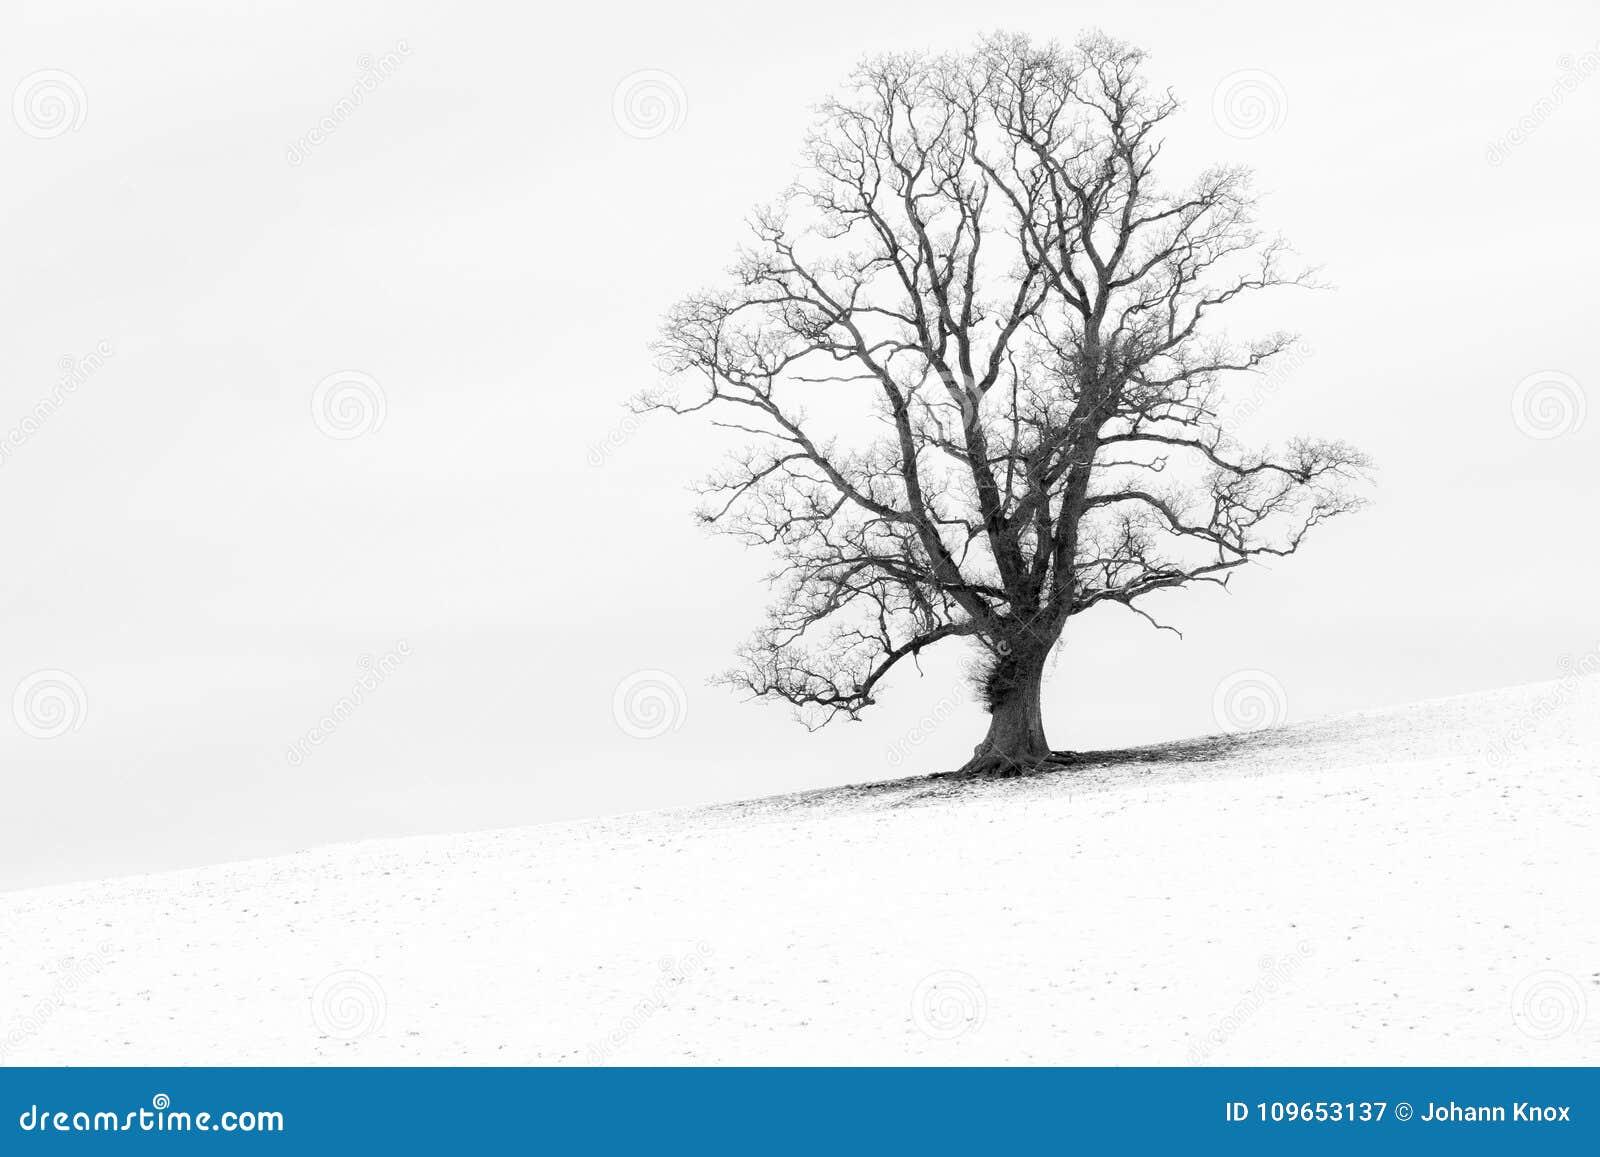 Single tree in a snow-white English landscape